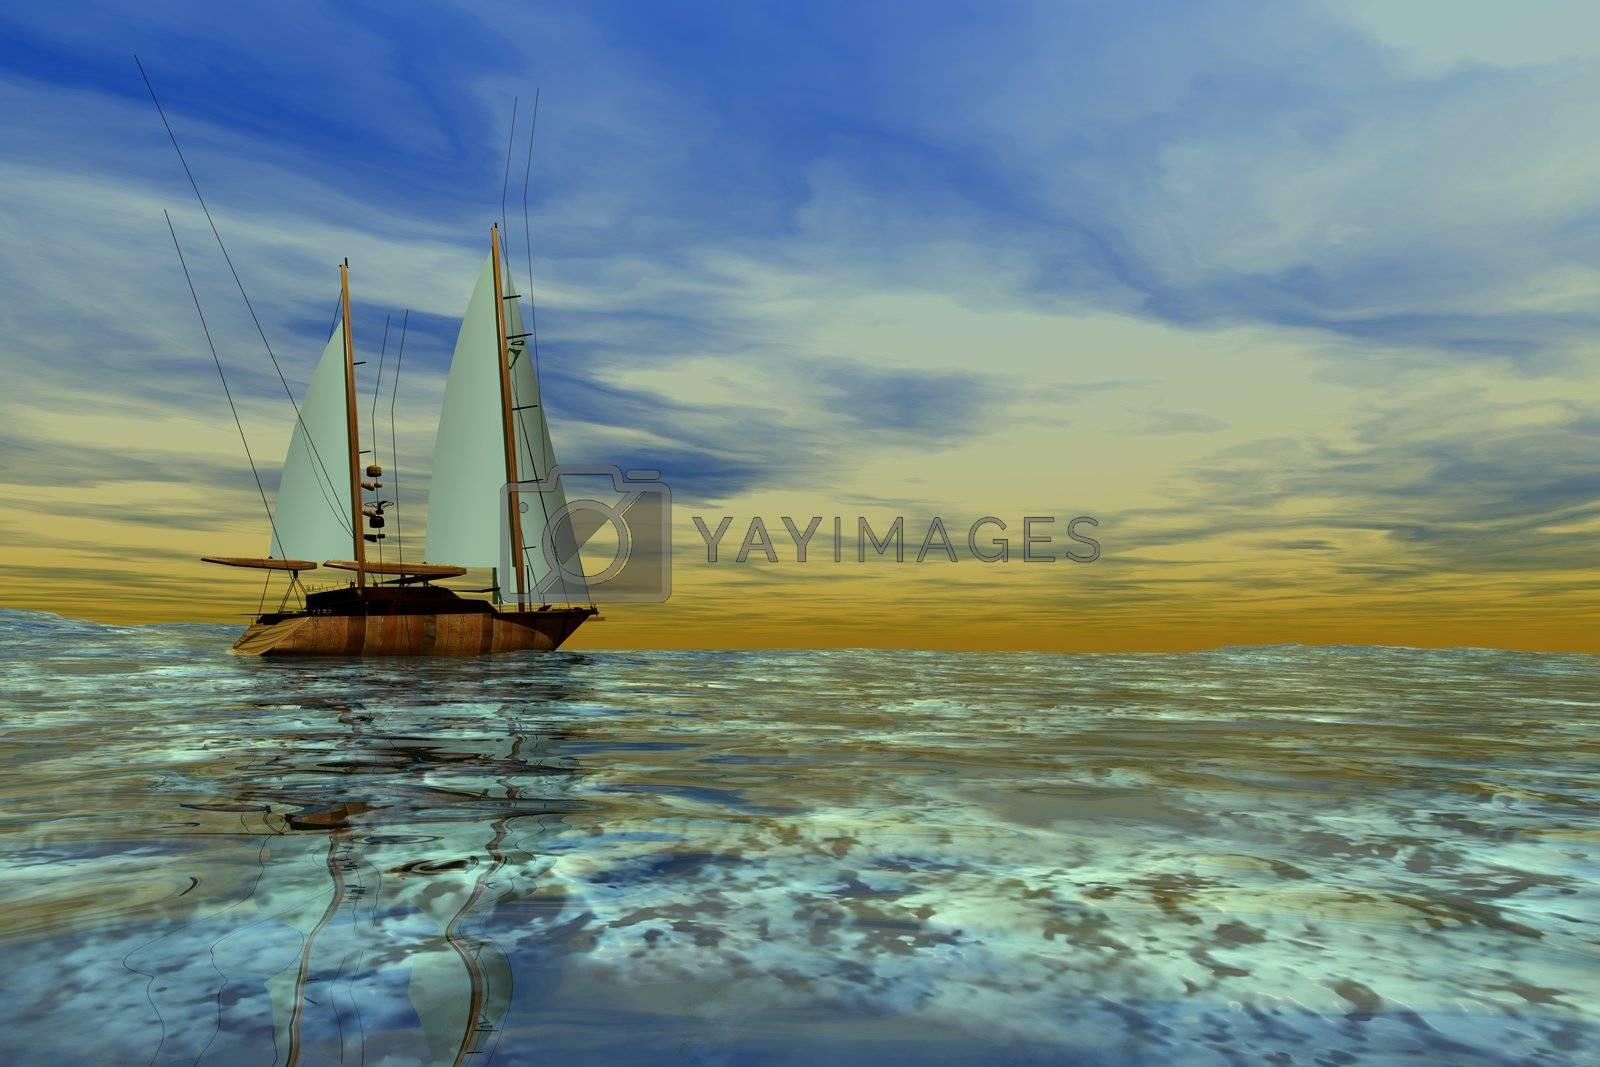 A sailboat heads toward the horizon on a beautiful day.